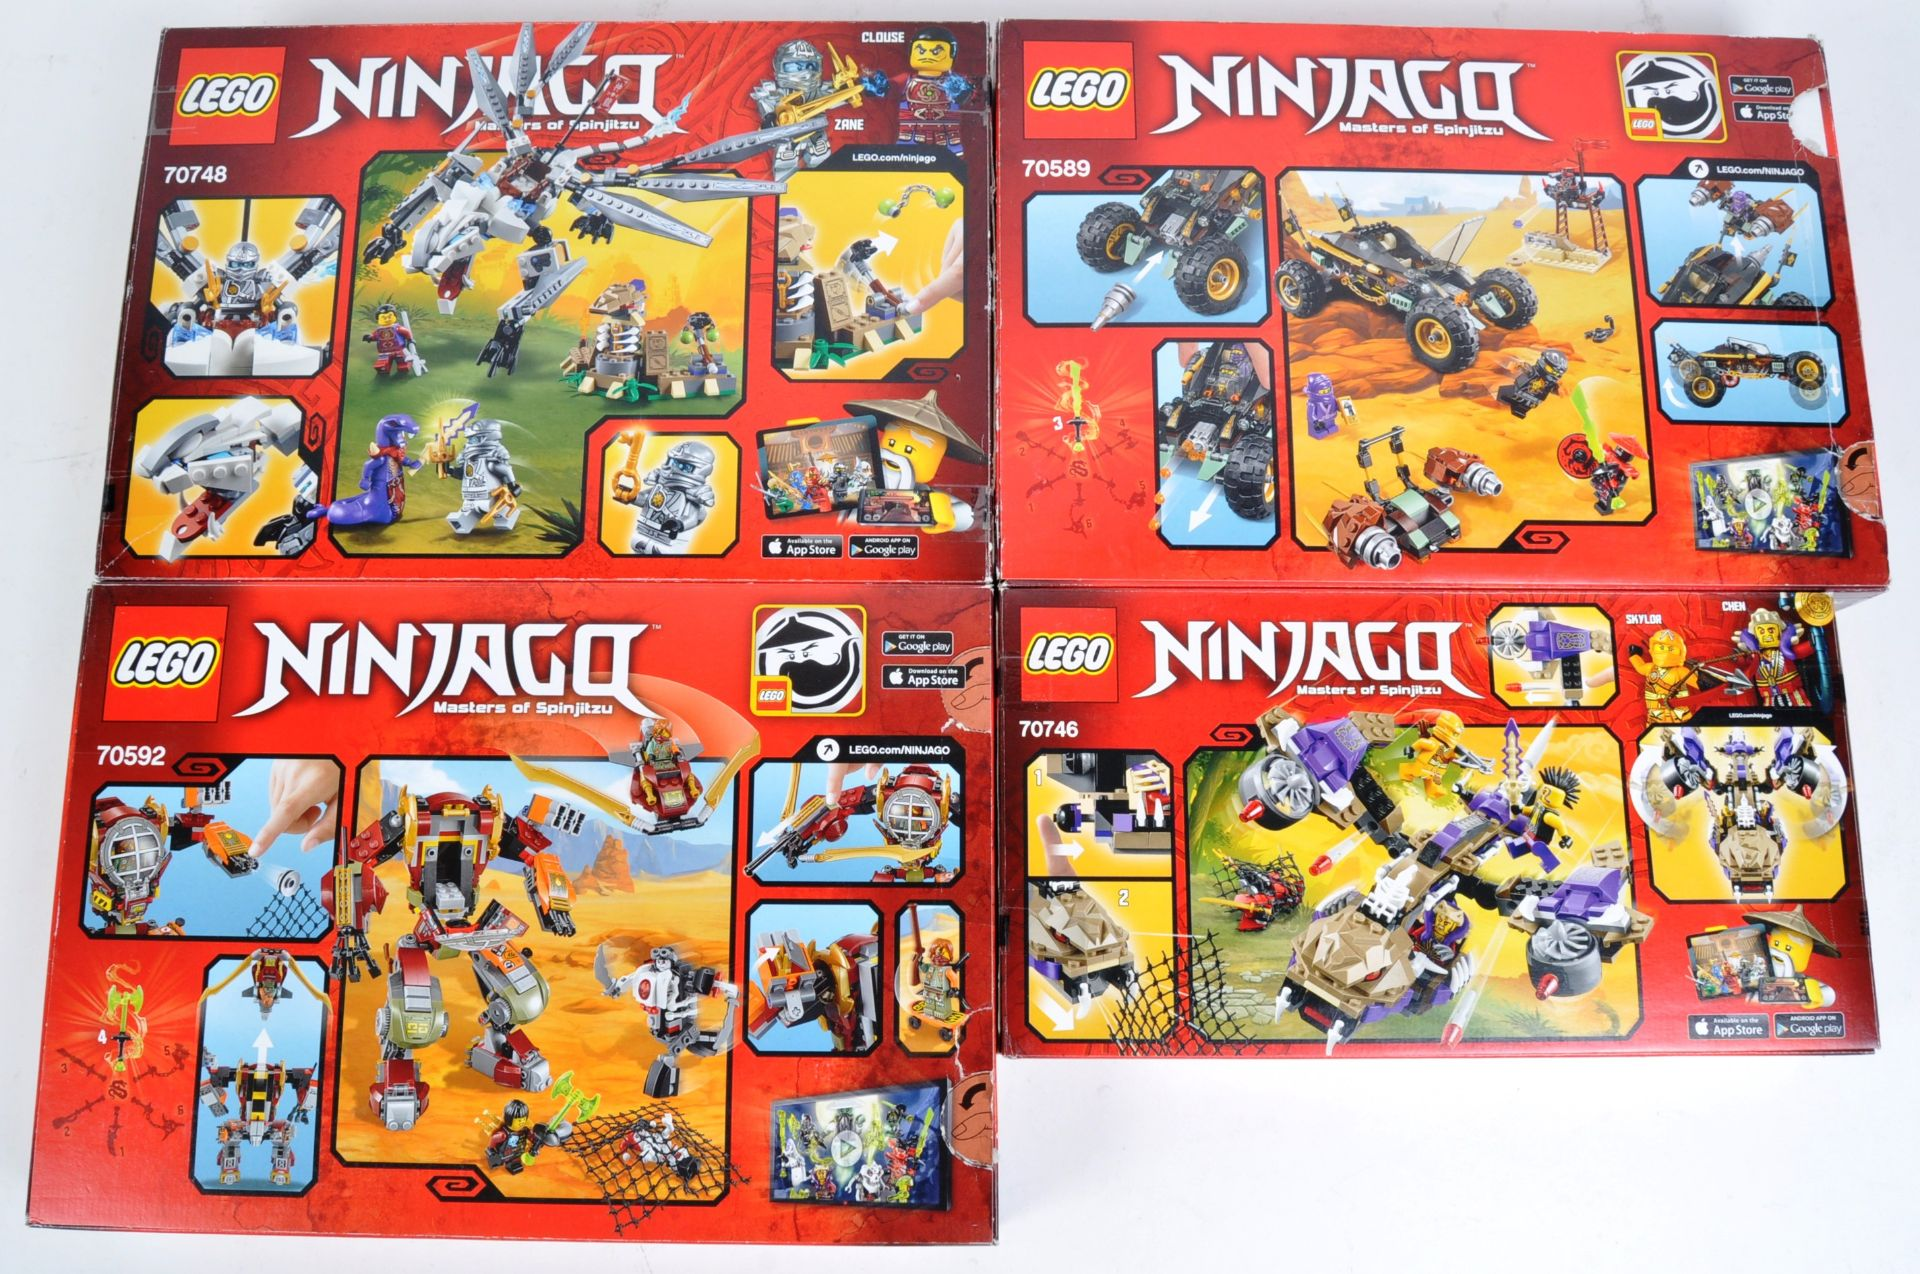 LEGO SETS - LEGO NINJAGO - 70589 / 70592 / 70746 / 70748 - Image 2 of 10